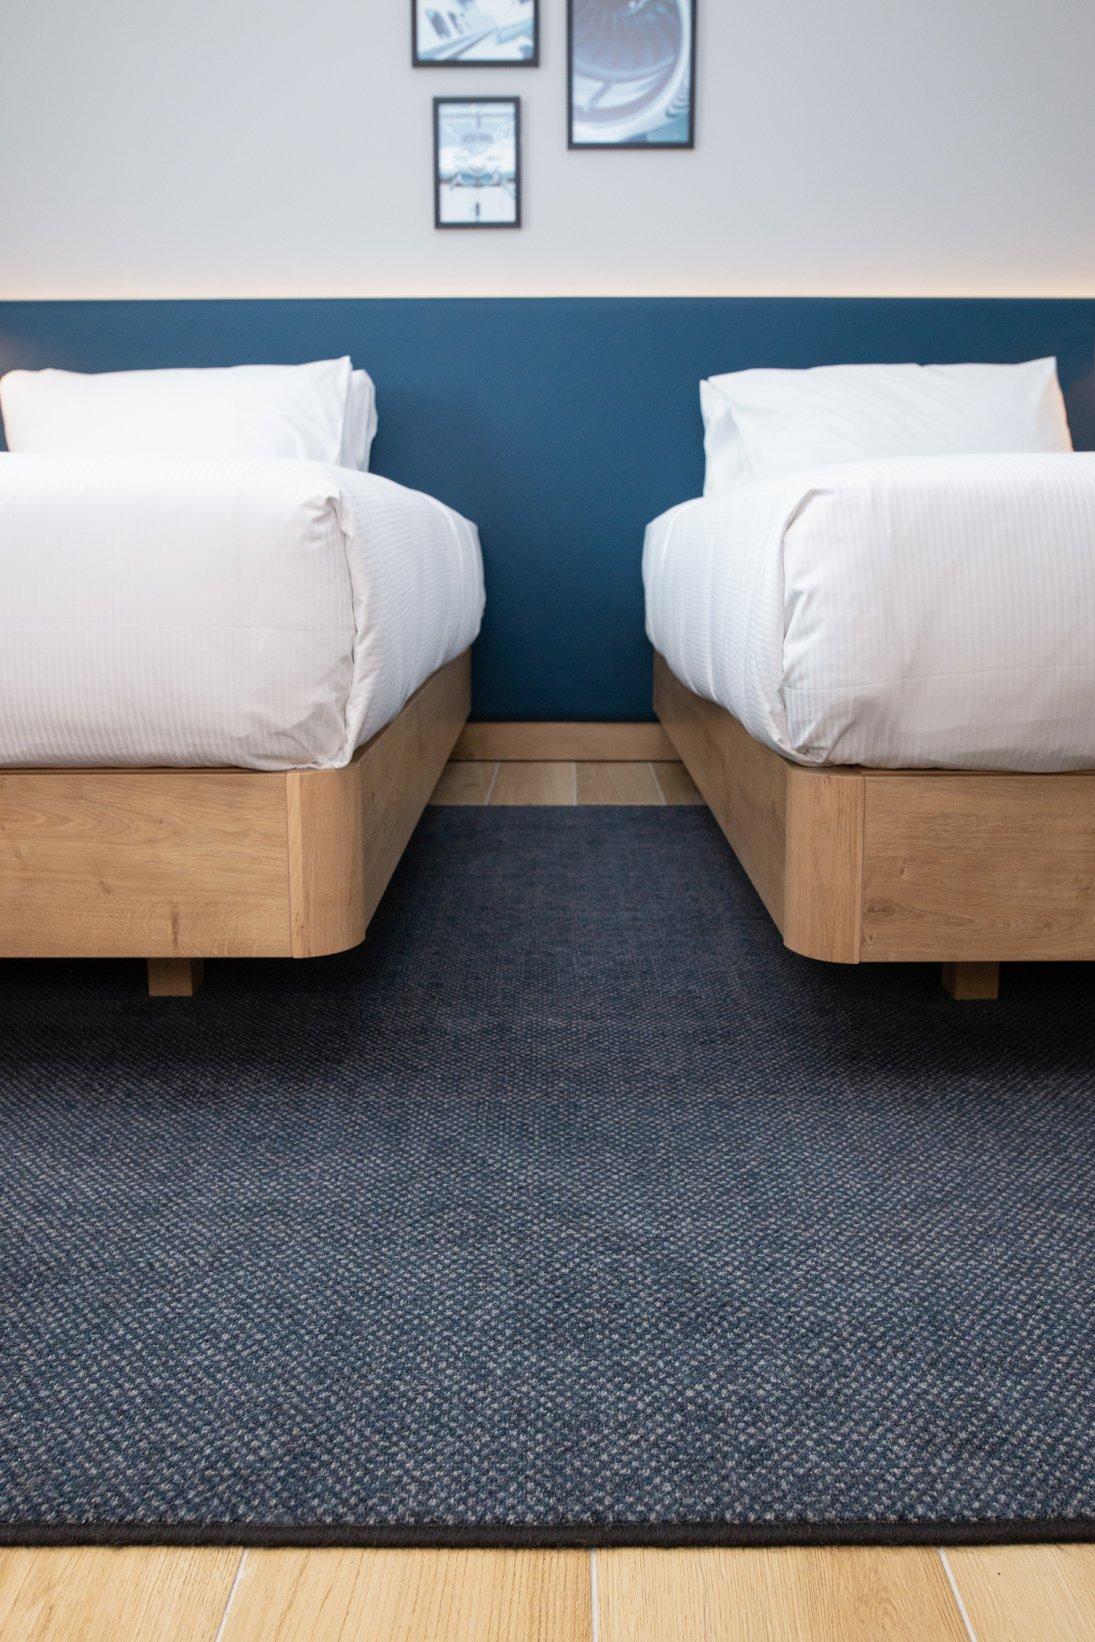 20200625-carpet-and-more-hilton-otopeni-10